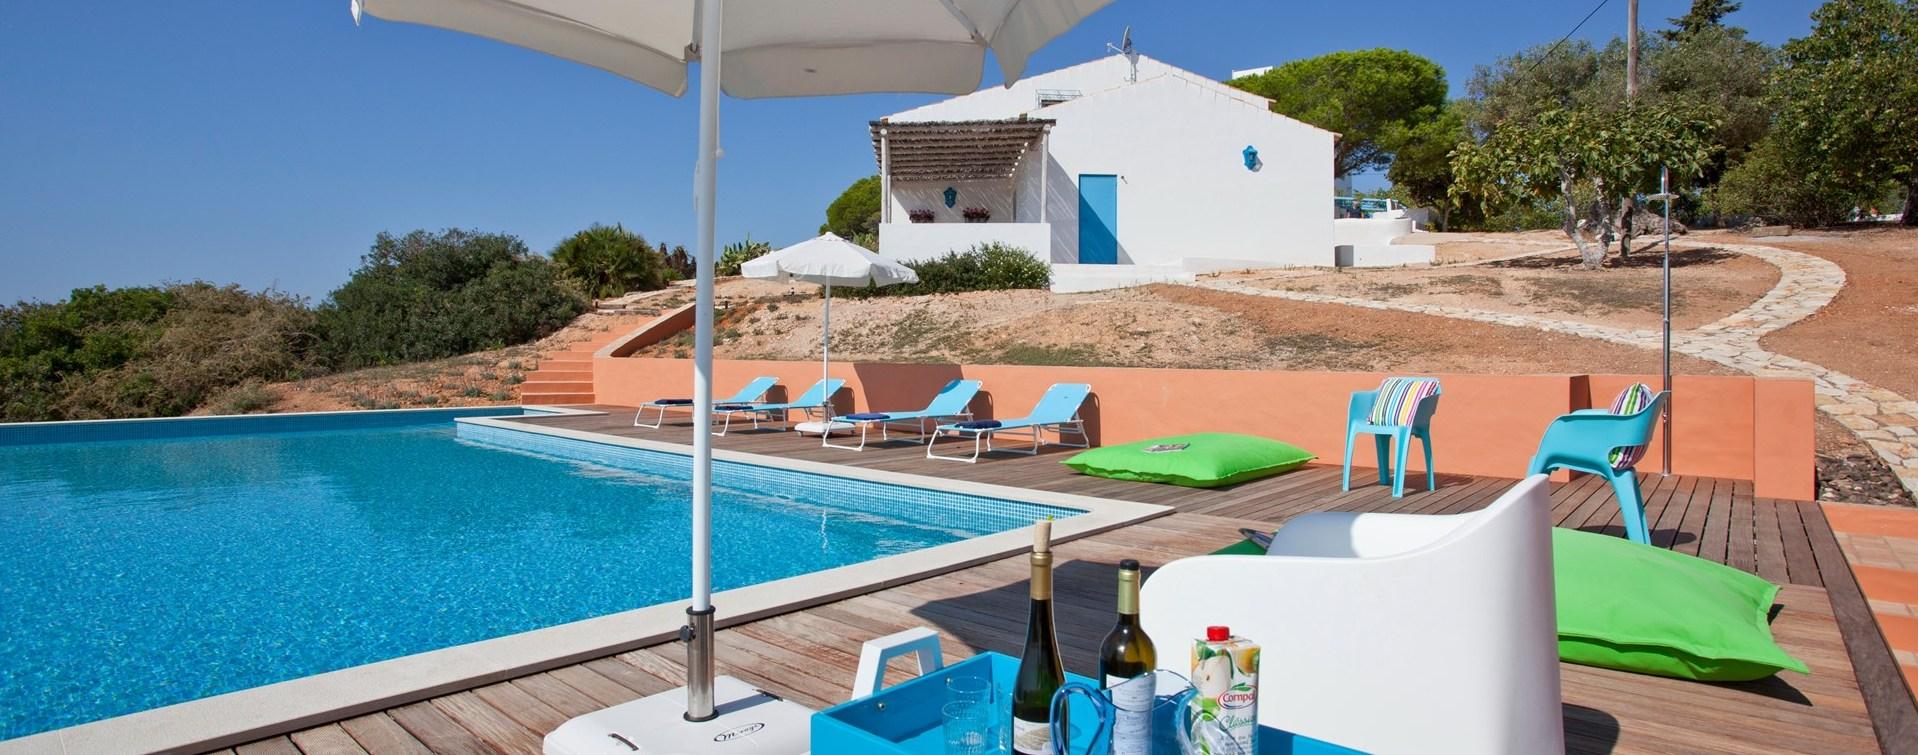 3-bedroom-pool-villa-algarve